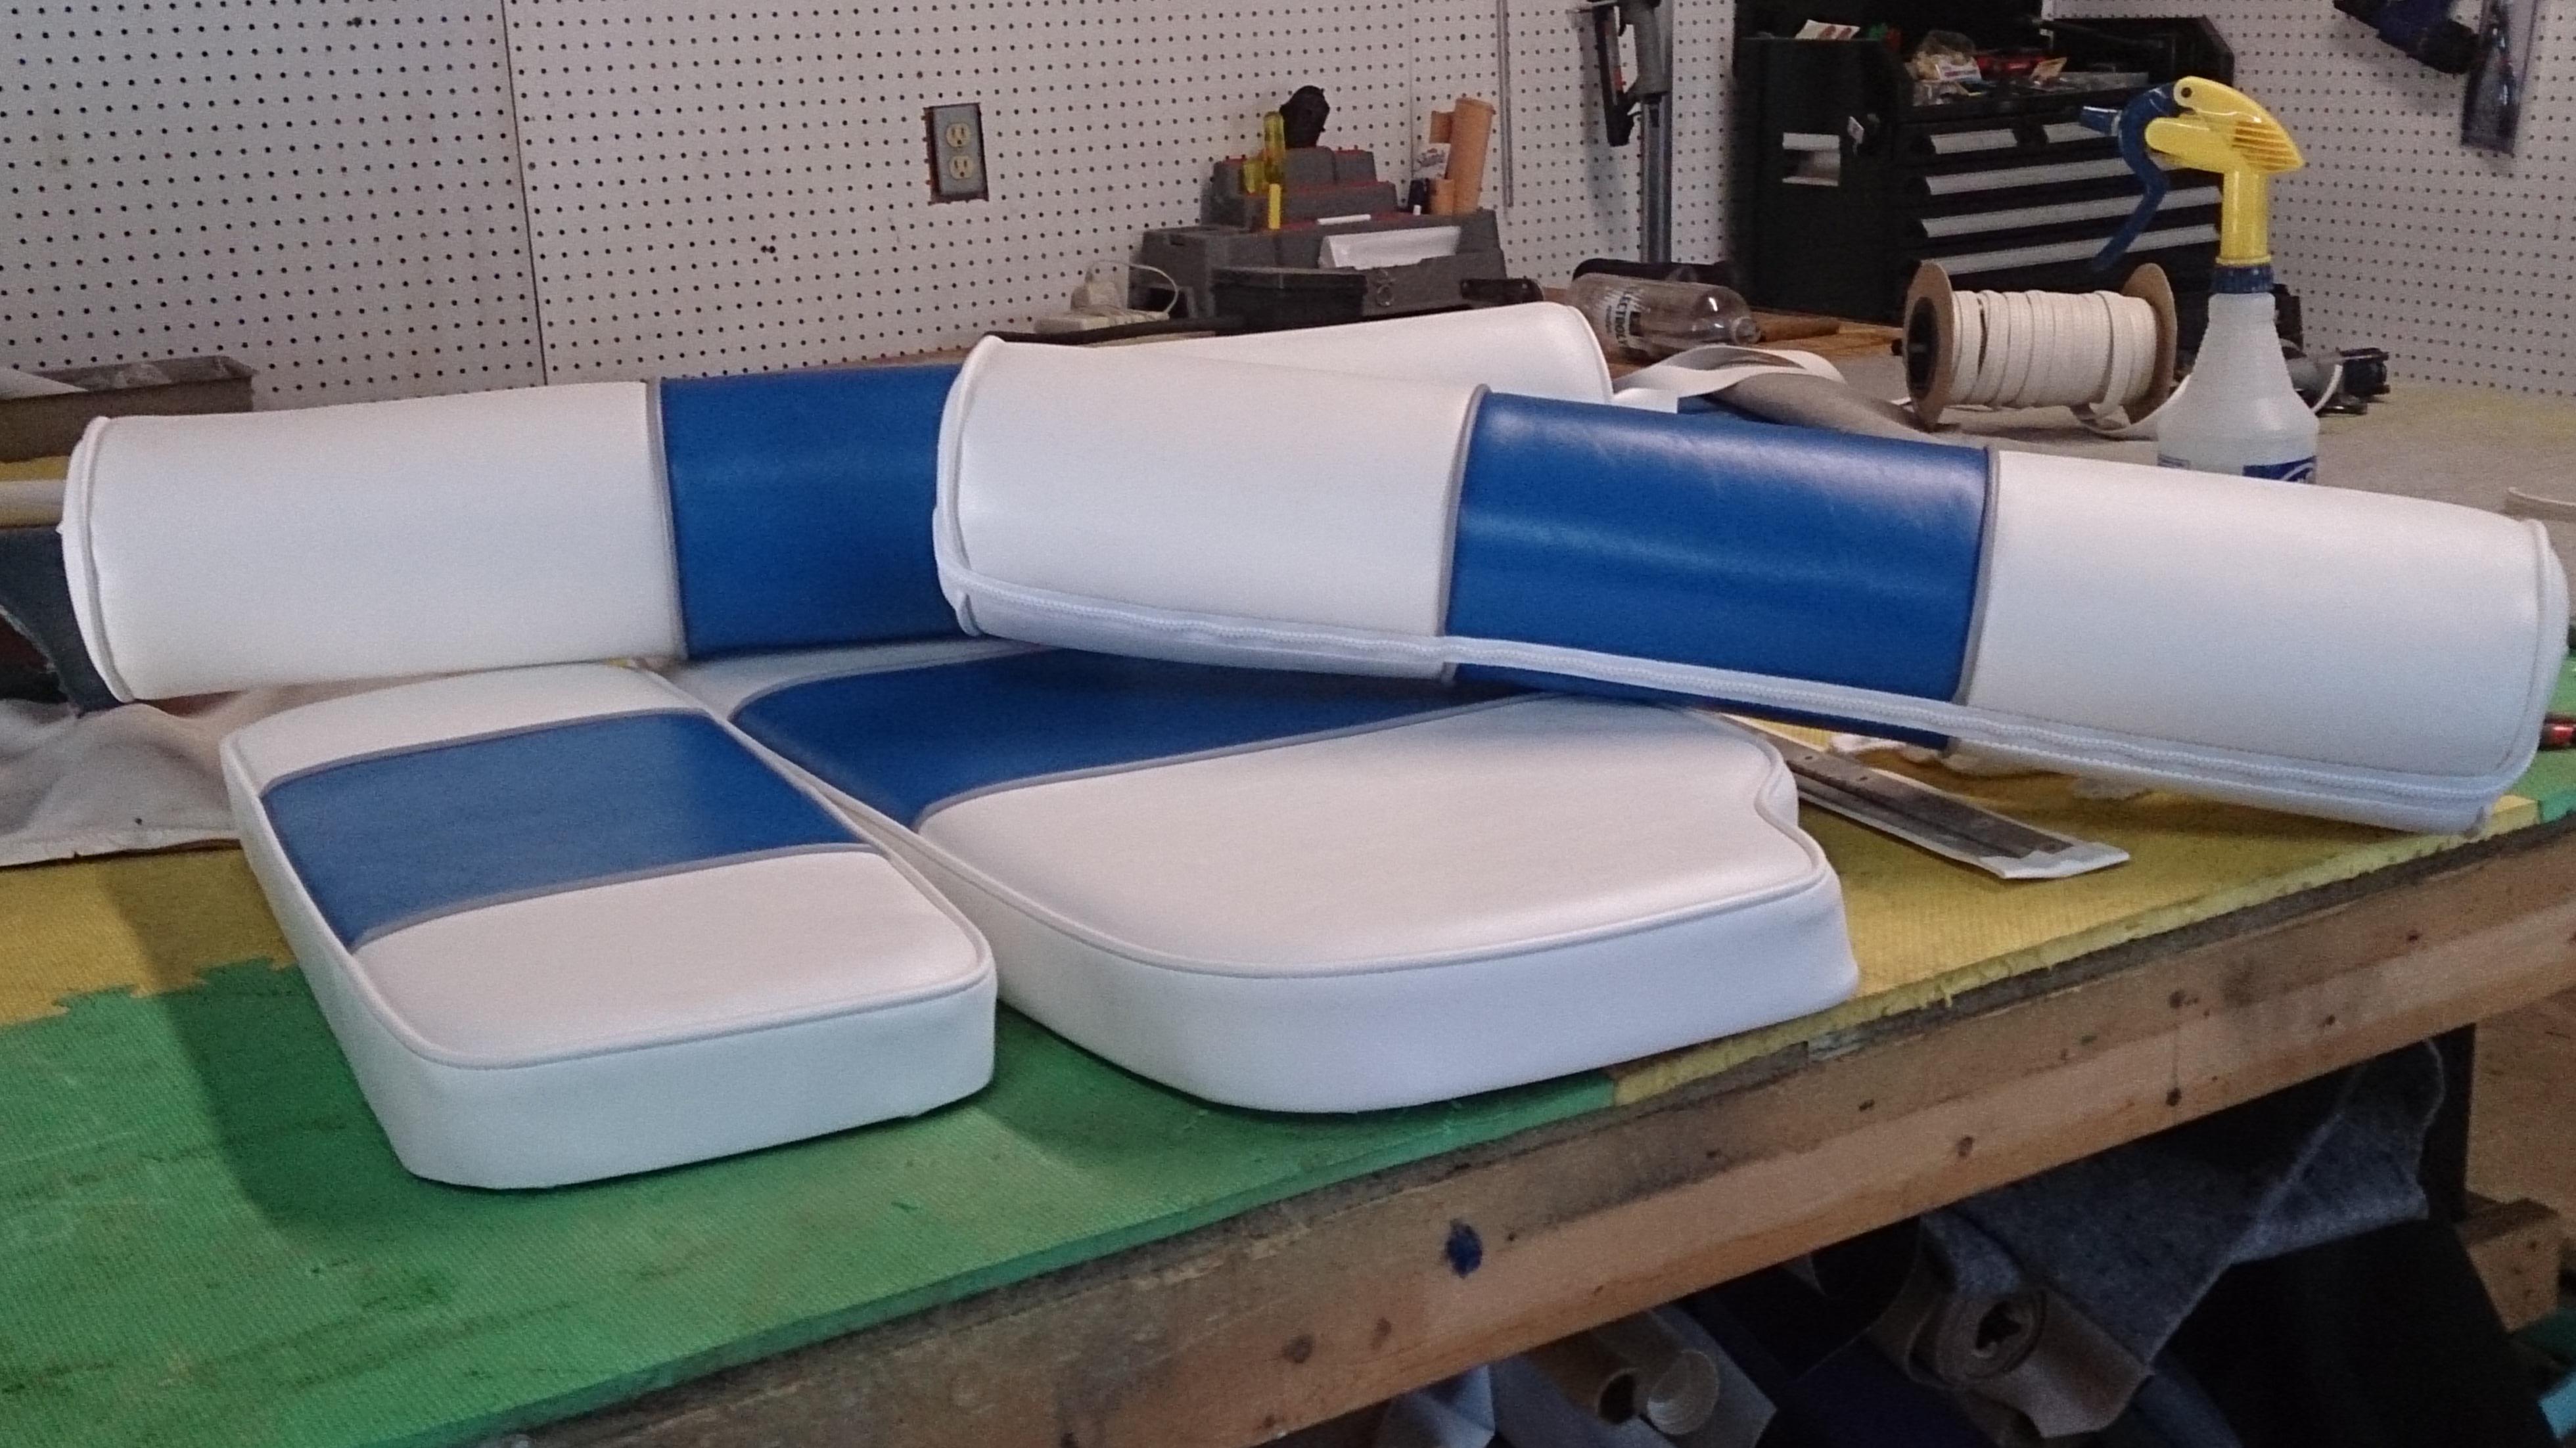 Custom Boat Upholstery 28 Images Boat Upholstery Custom Marine Canvas Upholstery Fort